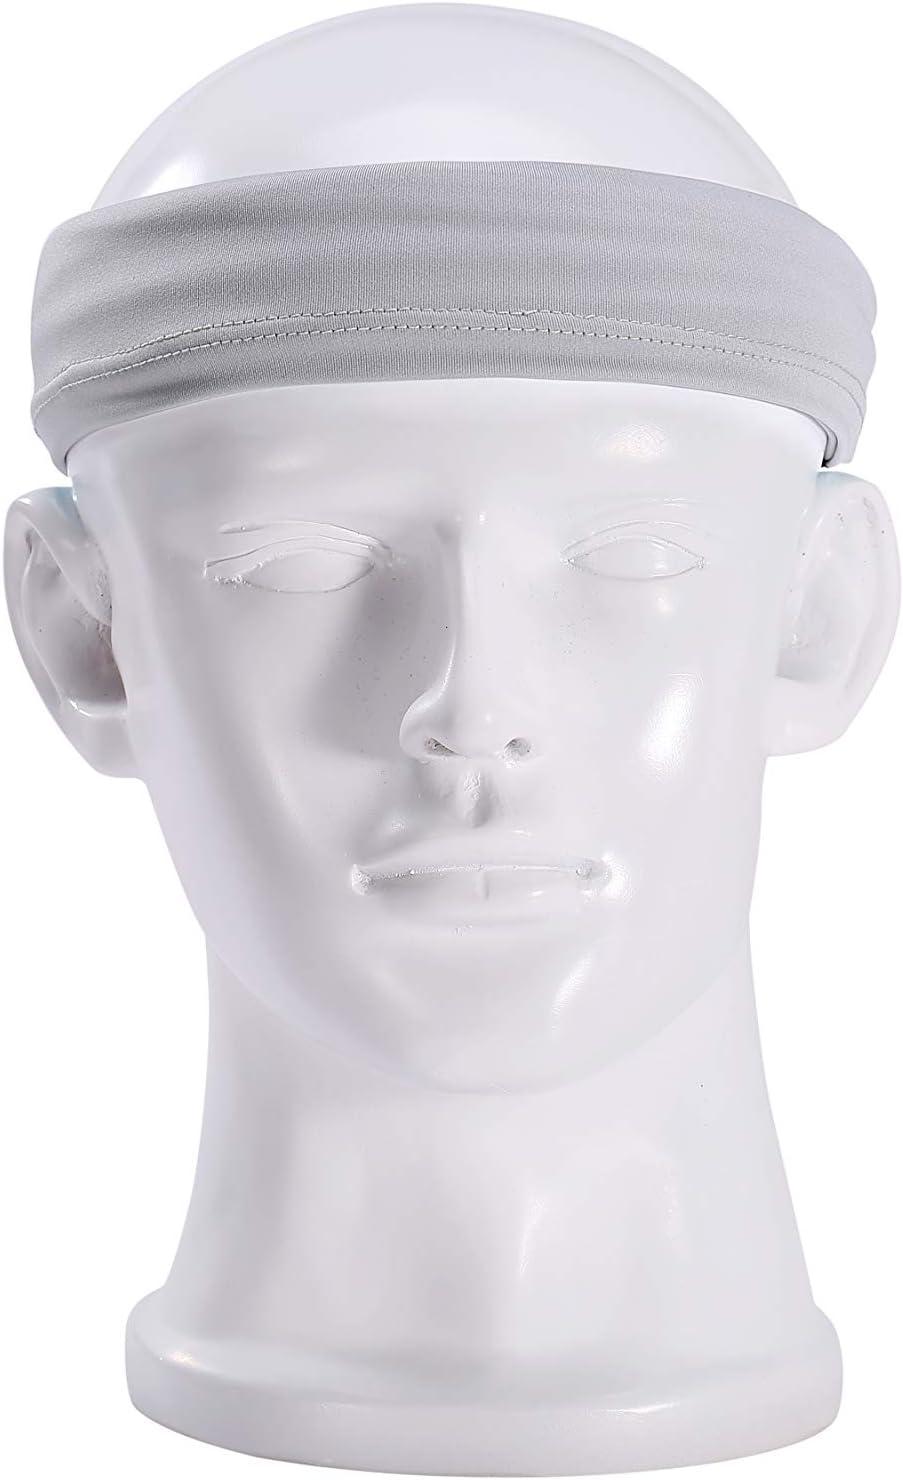 Ligart Cooling Headwear Lightweight Thin Neck Gaiter Summer Protection from Sun Surf Wind and Moisture Face Mask Headwear Headband Bandana for Outdoor Sport